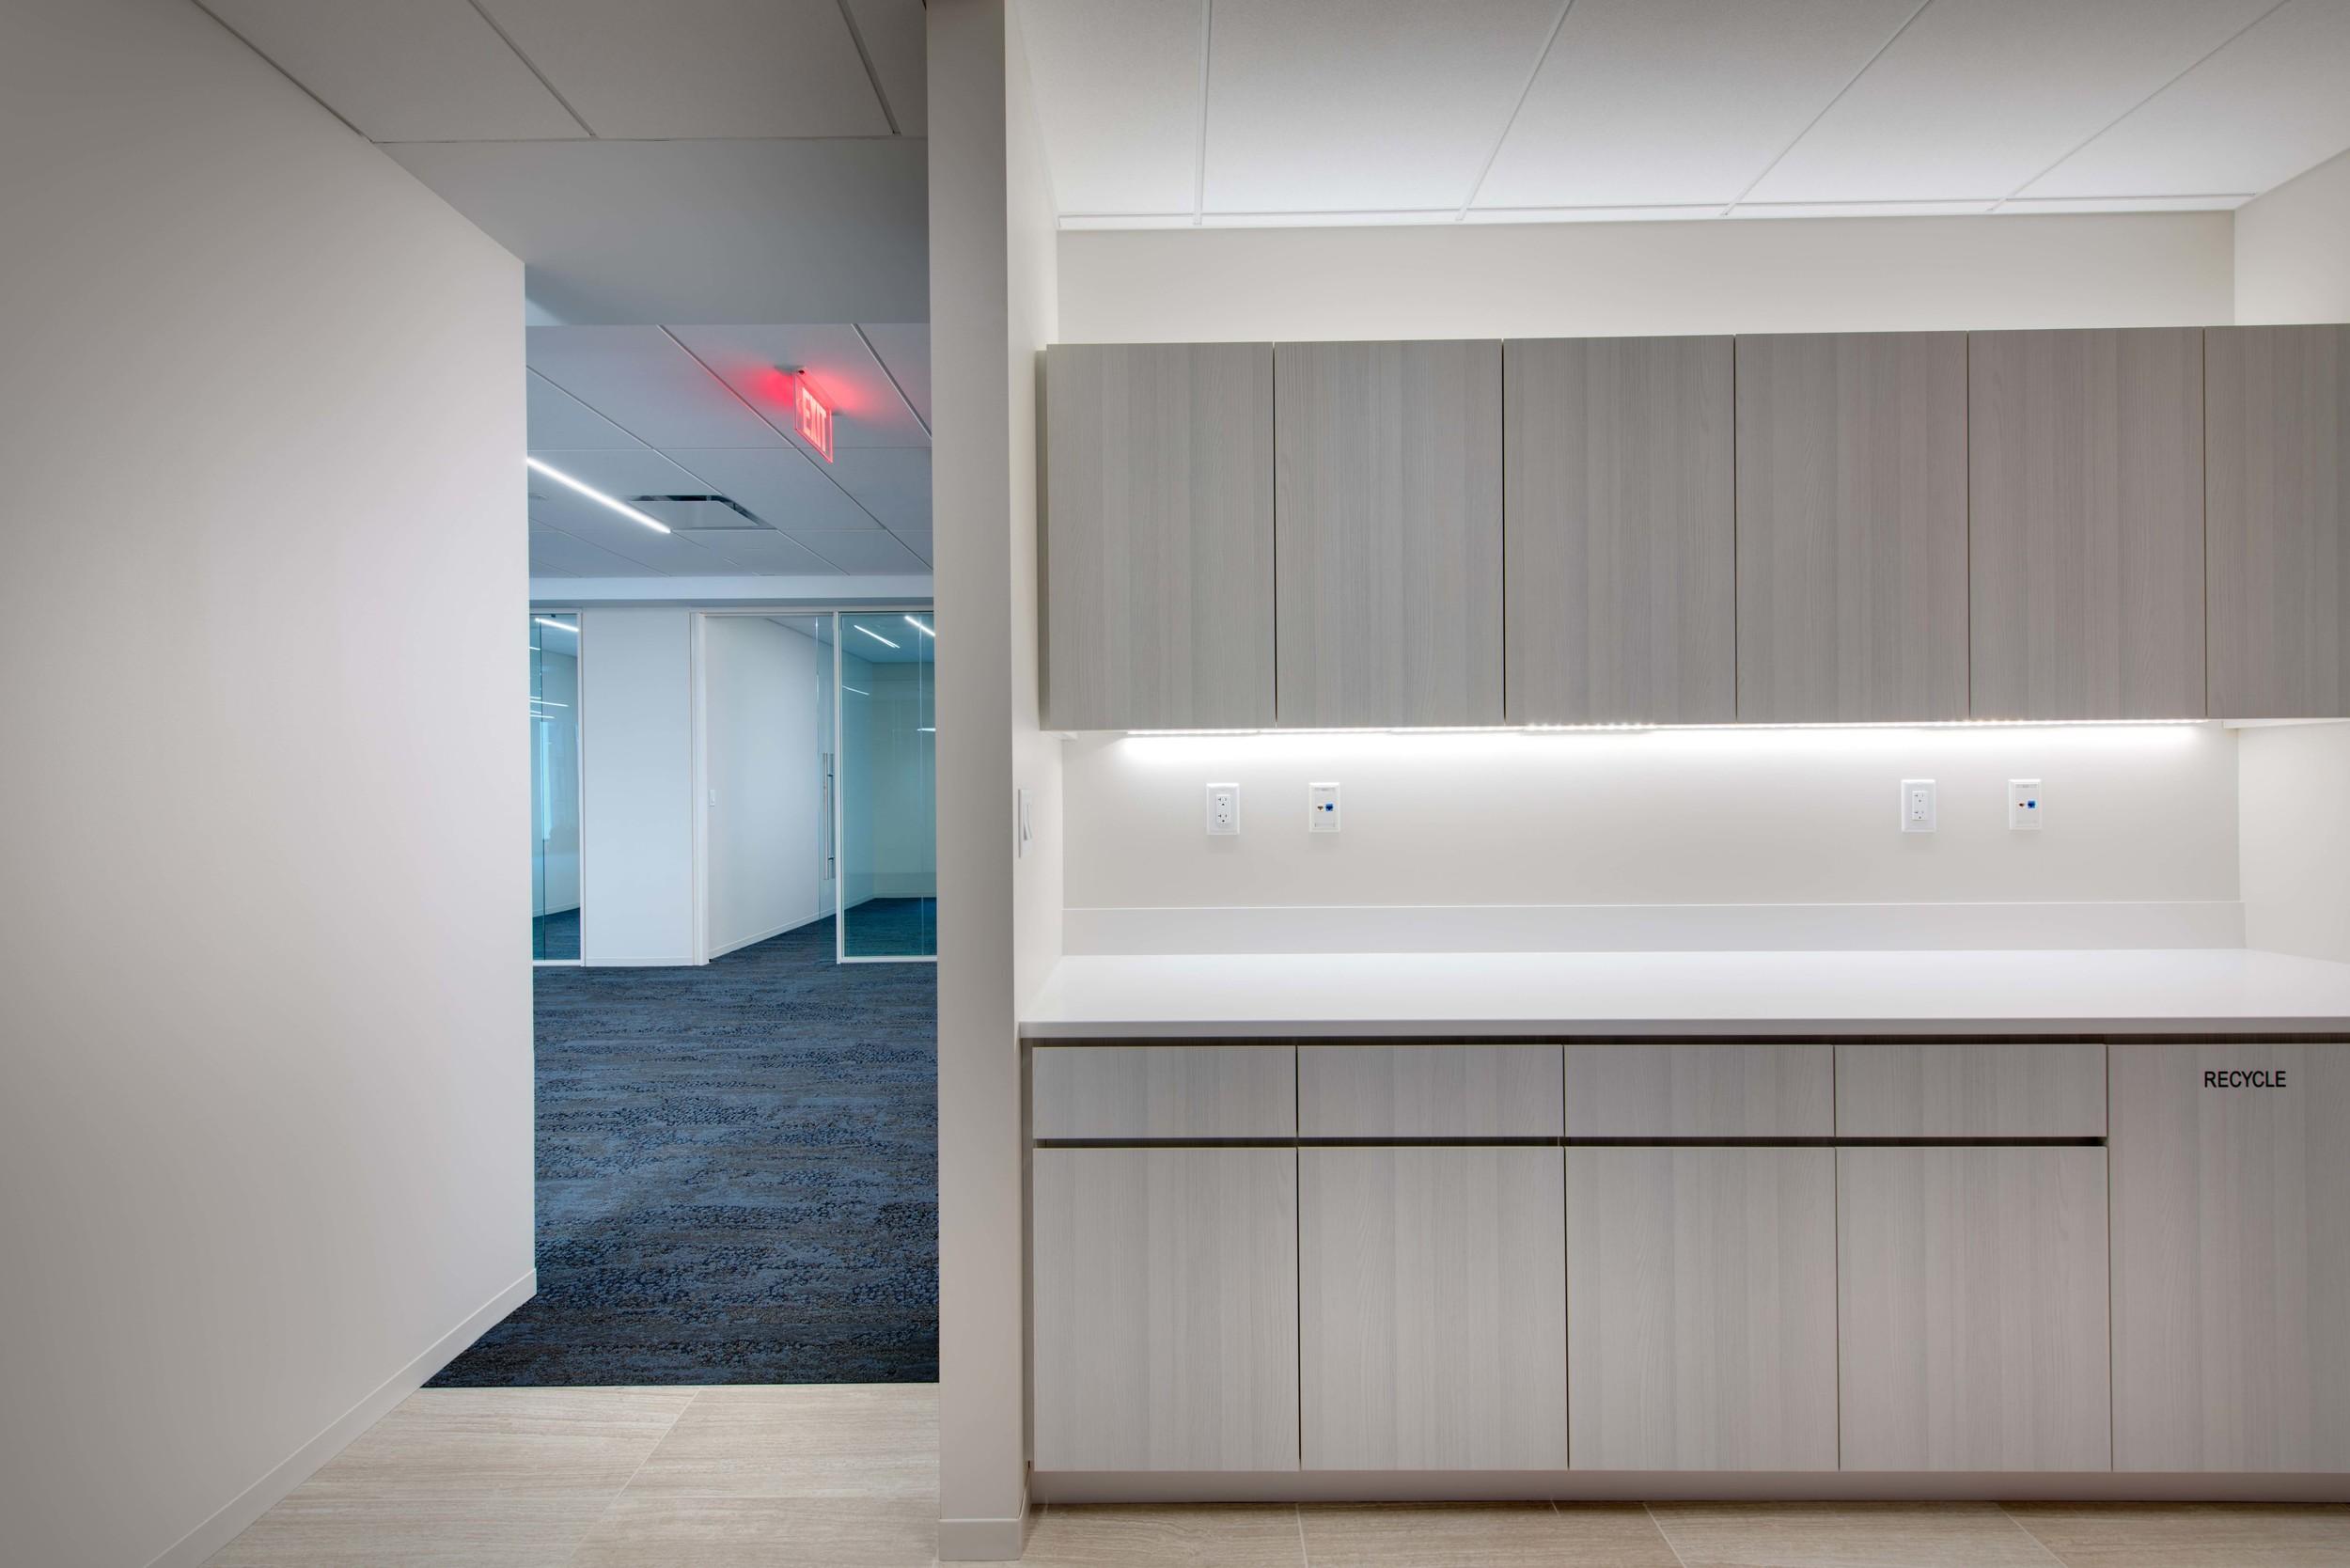 1200 17th Office Suite Interior Image 216425.jpg